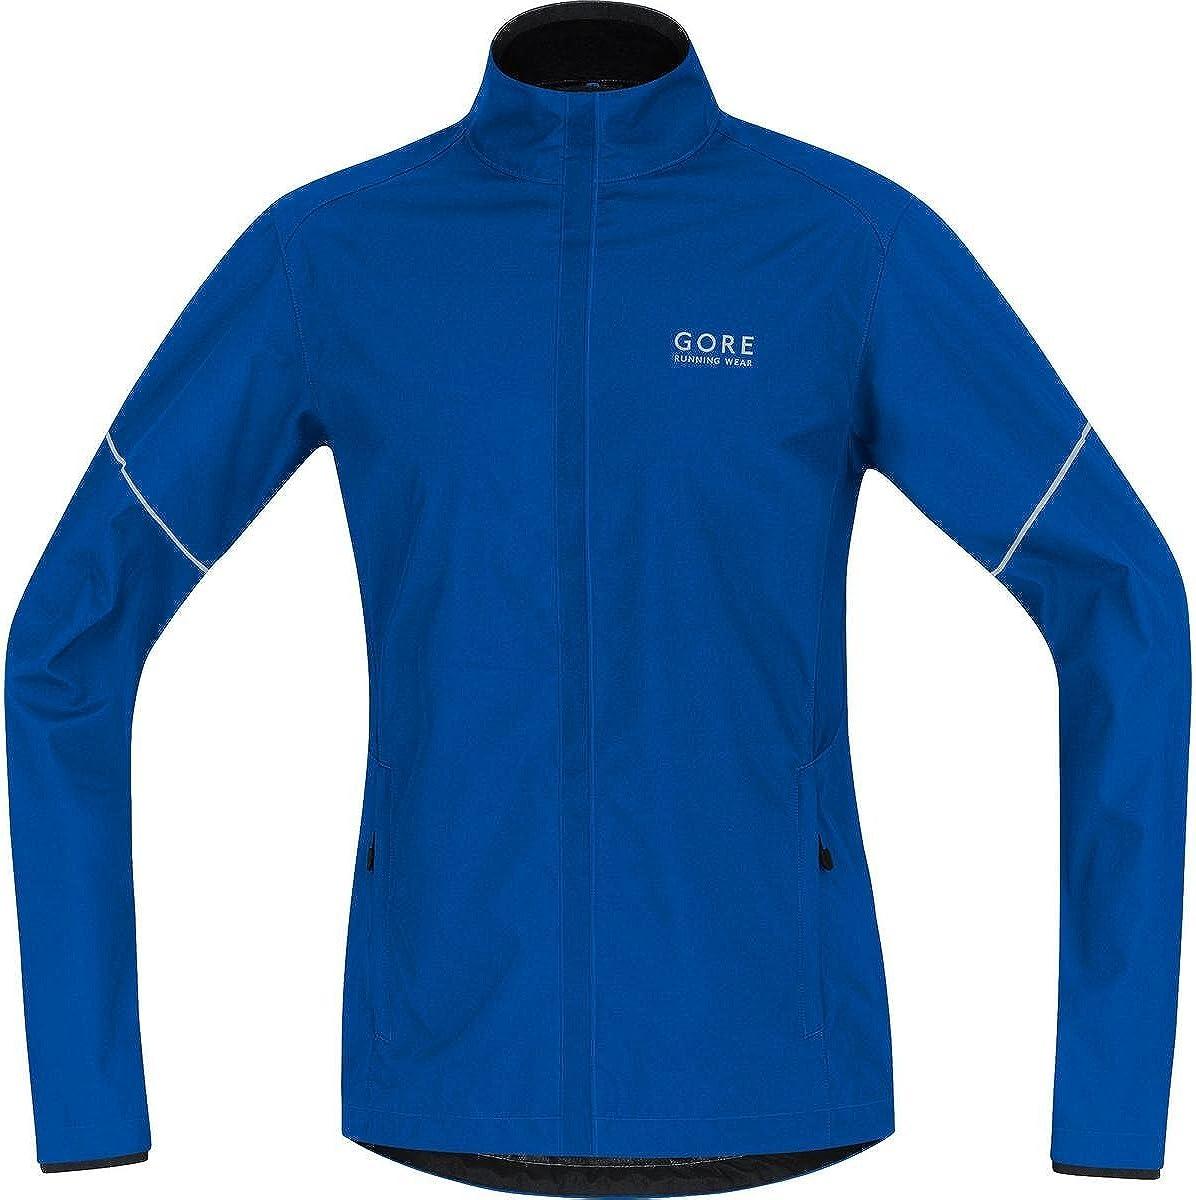 R3 Partial GORE WINDSTOPPER Jacket 100091 GORE Wear Windproof Mens Running Jacket